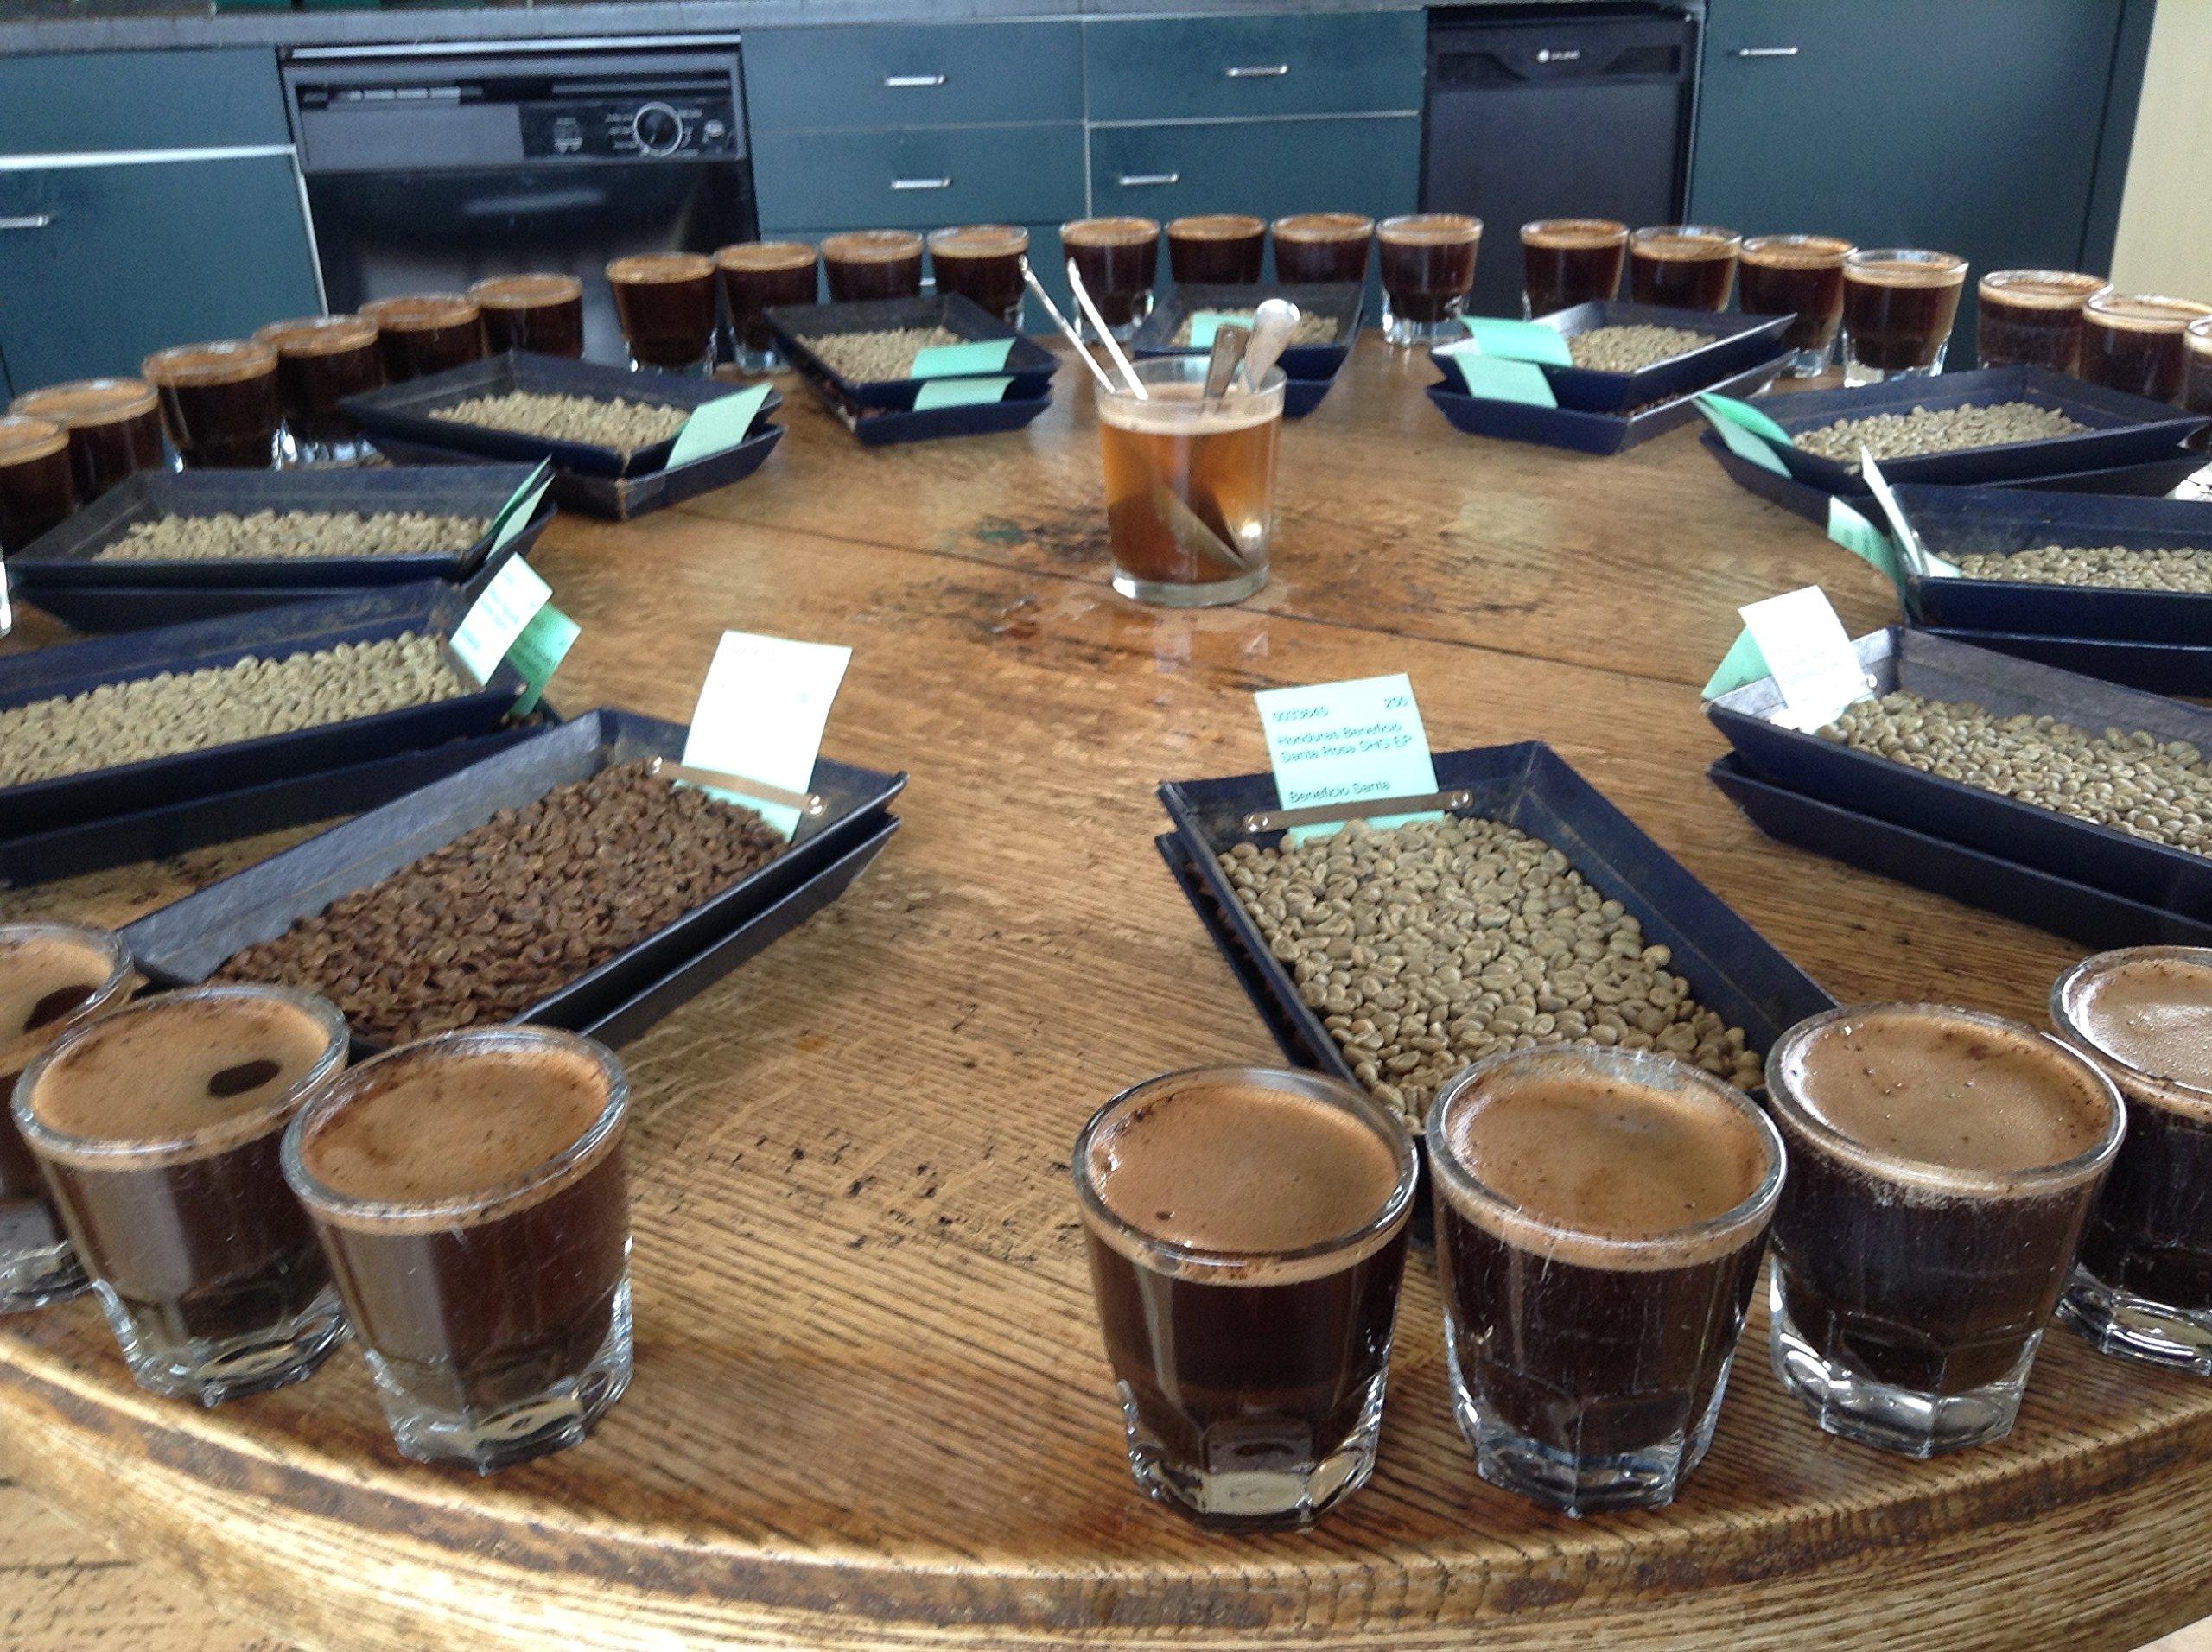 Ethiopian Yirgacheffe Green Unroasted Coffee Beans 1 Pound